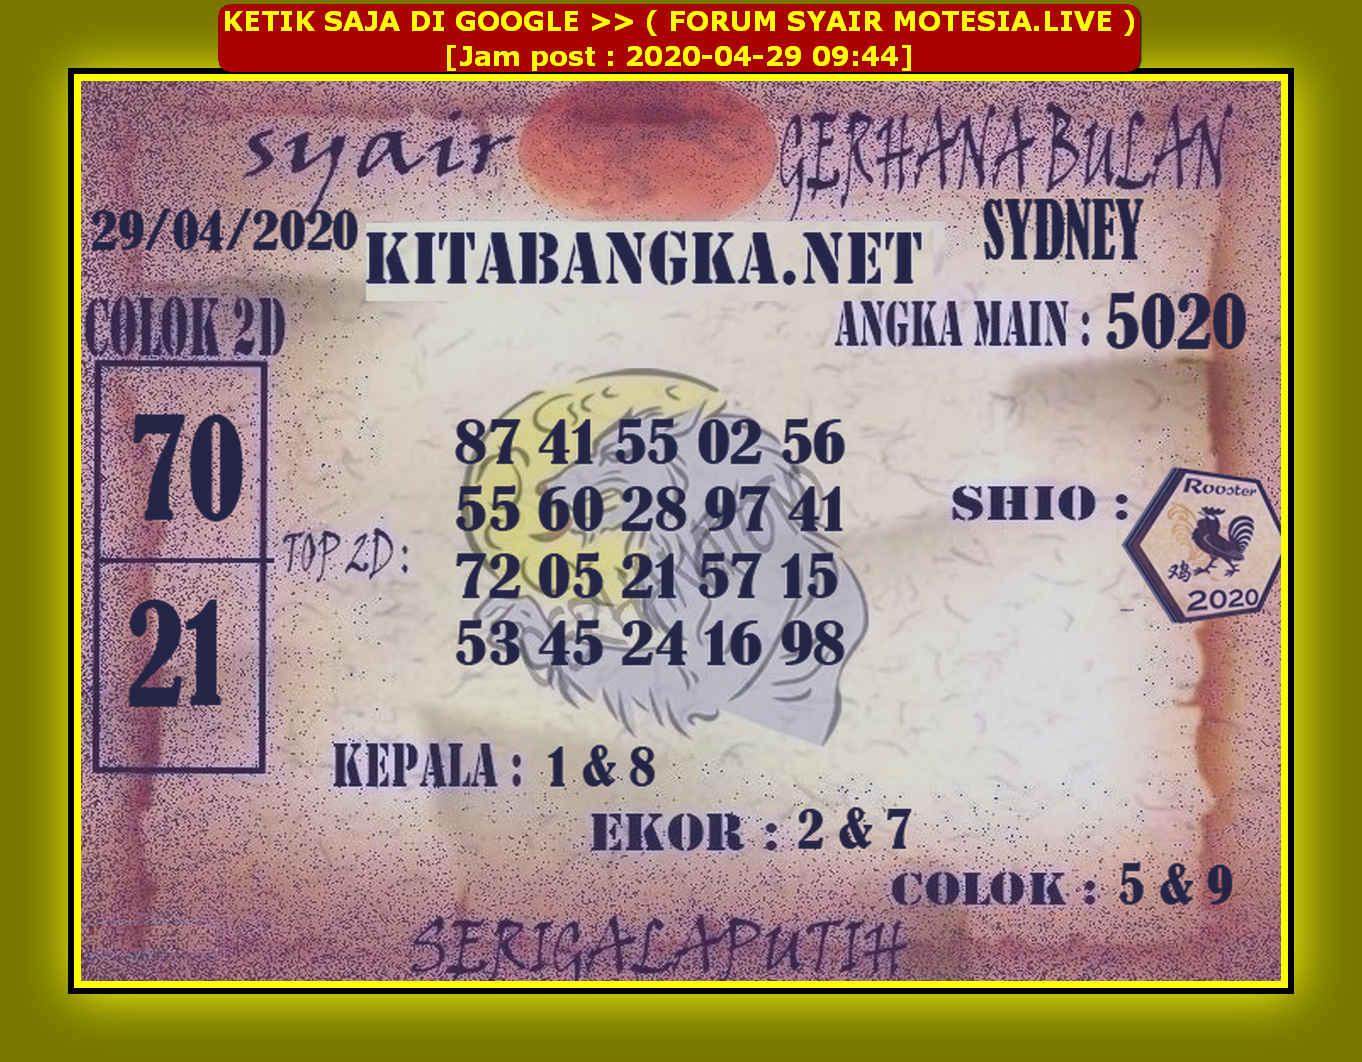 Kode syair Sydney Rabu 29 April 2020 71